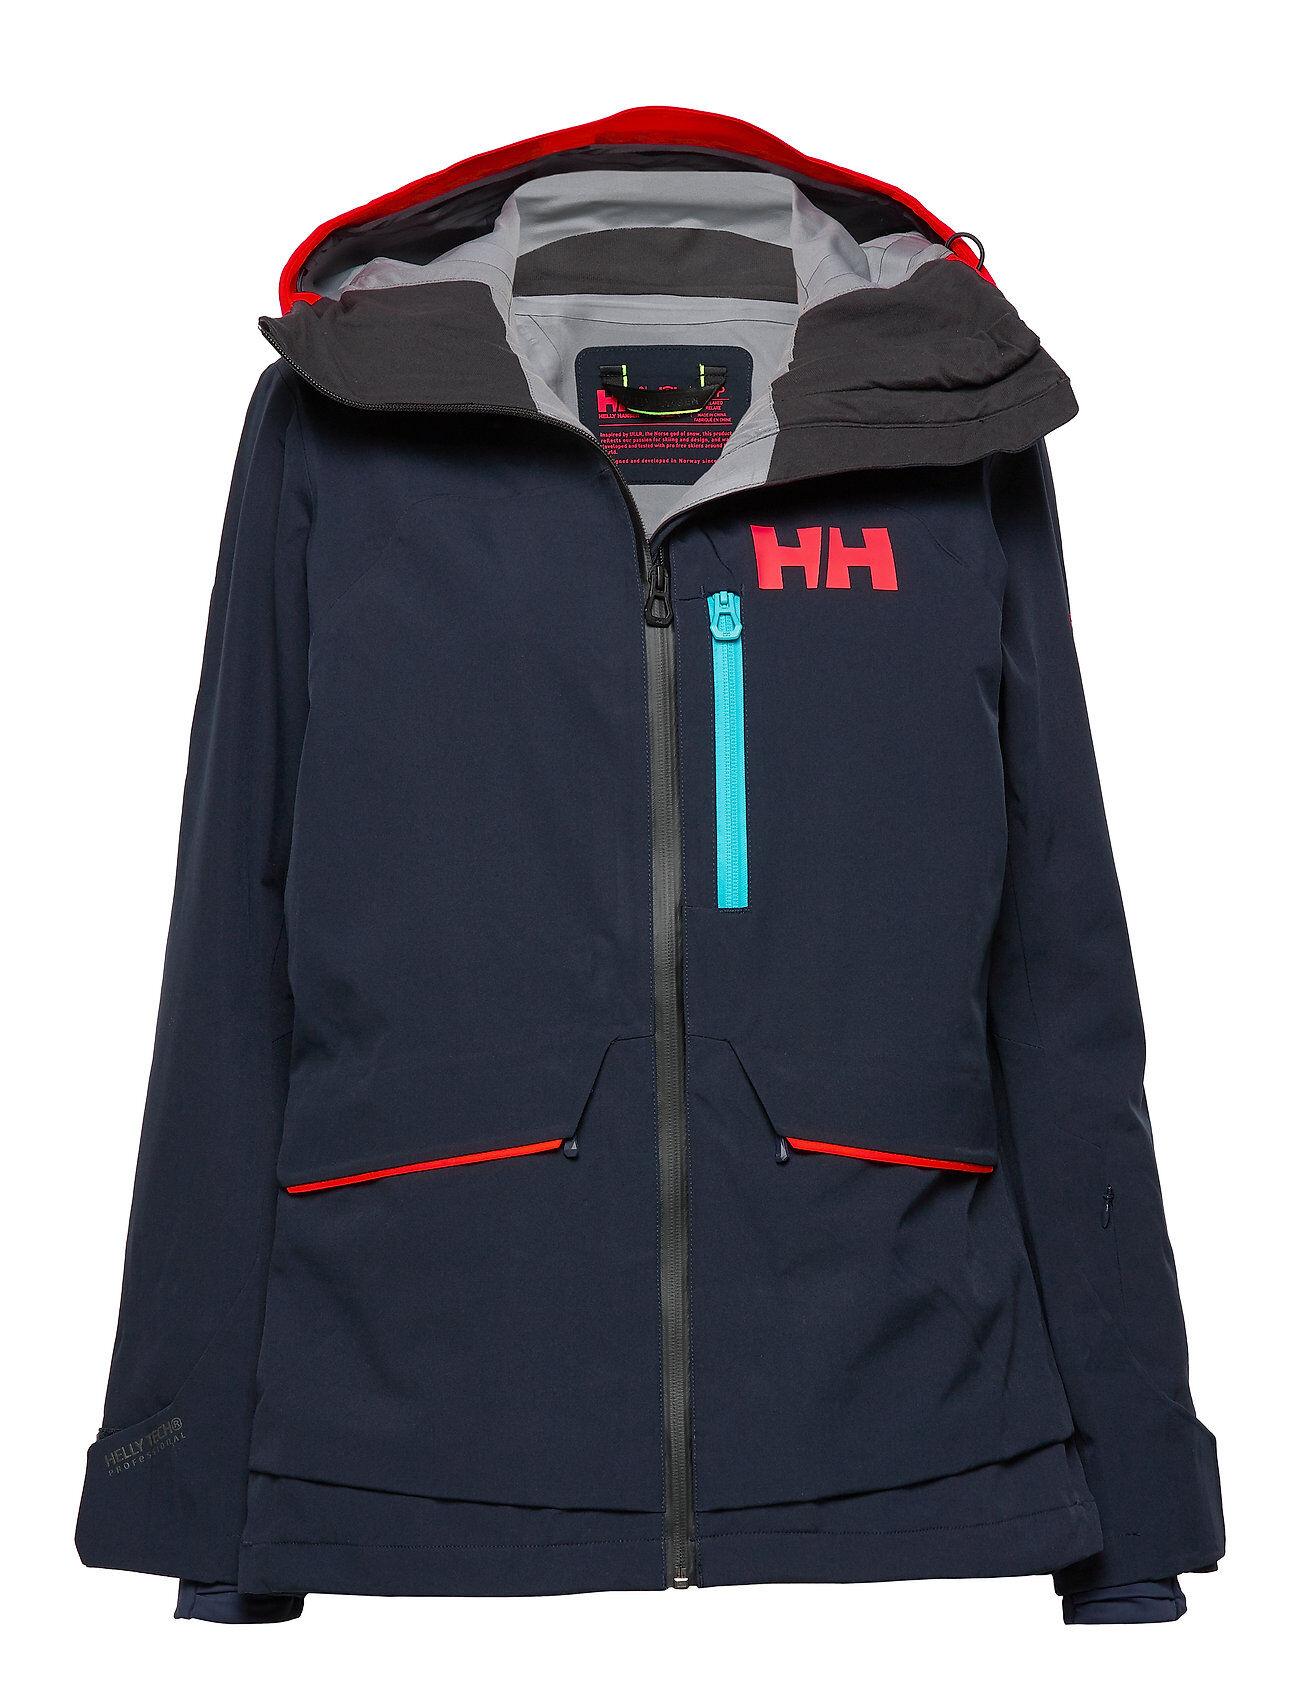 Image of Helly Hansen W Aurora Shell 2.0 Jacket Outerwear Sport Jackets Sininen